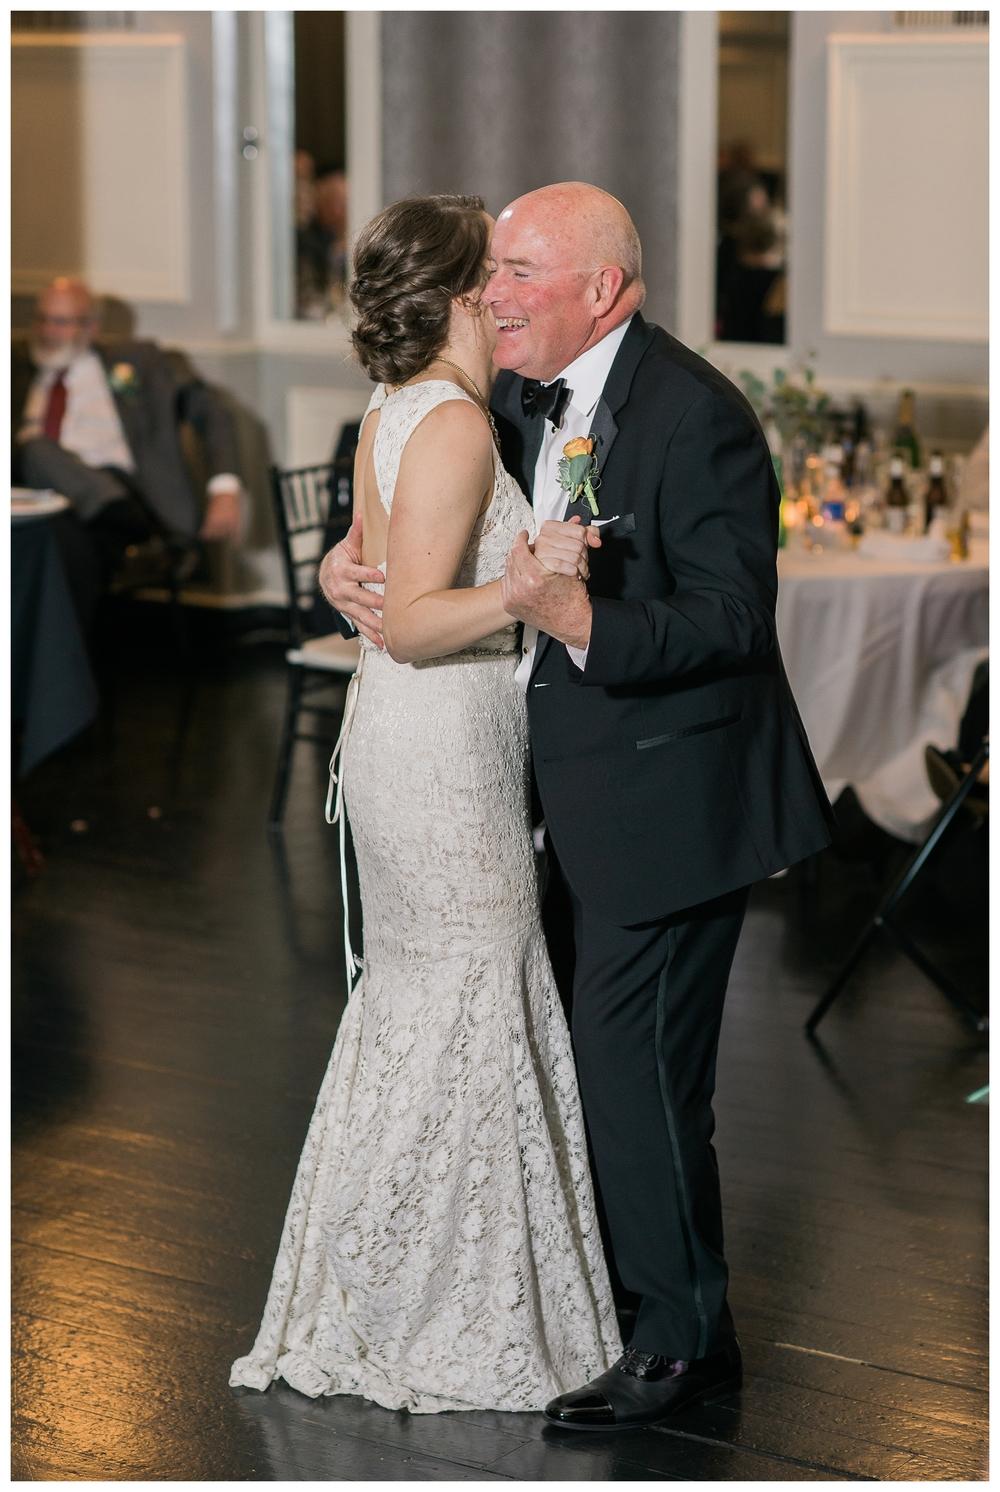 Rebecca_Bridges_Photography_Indianapolis_Wedding_Photographer_4494.jpg